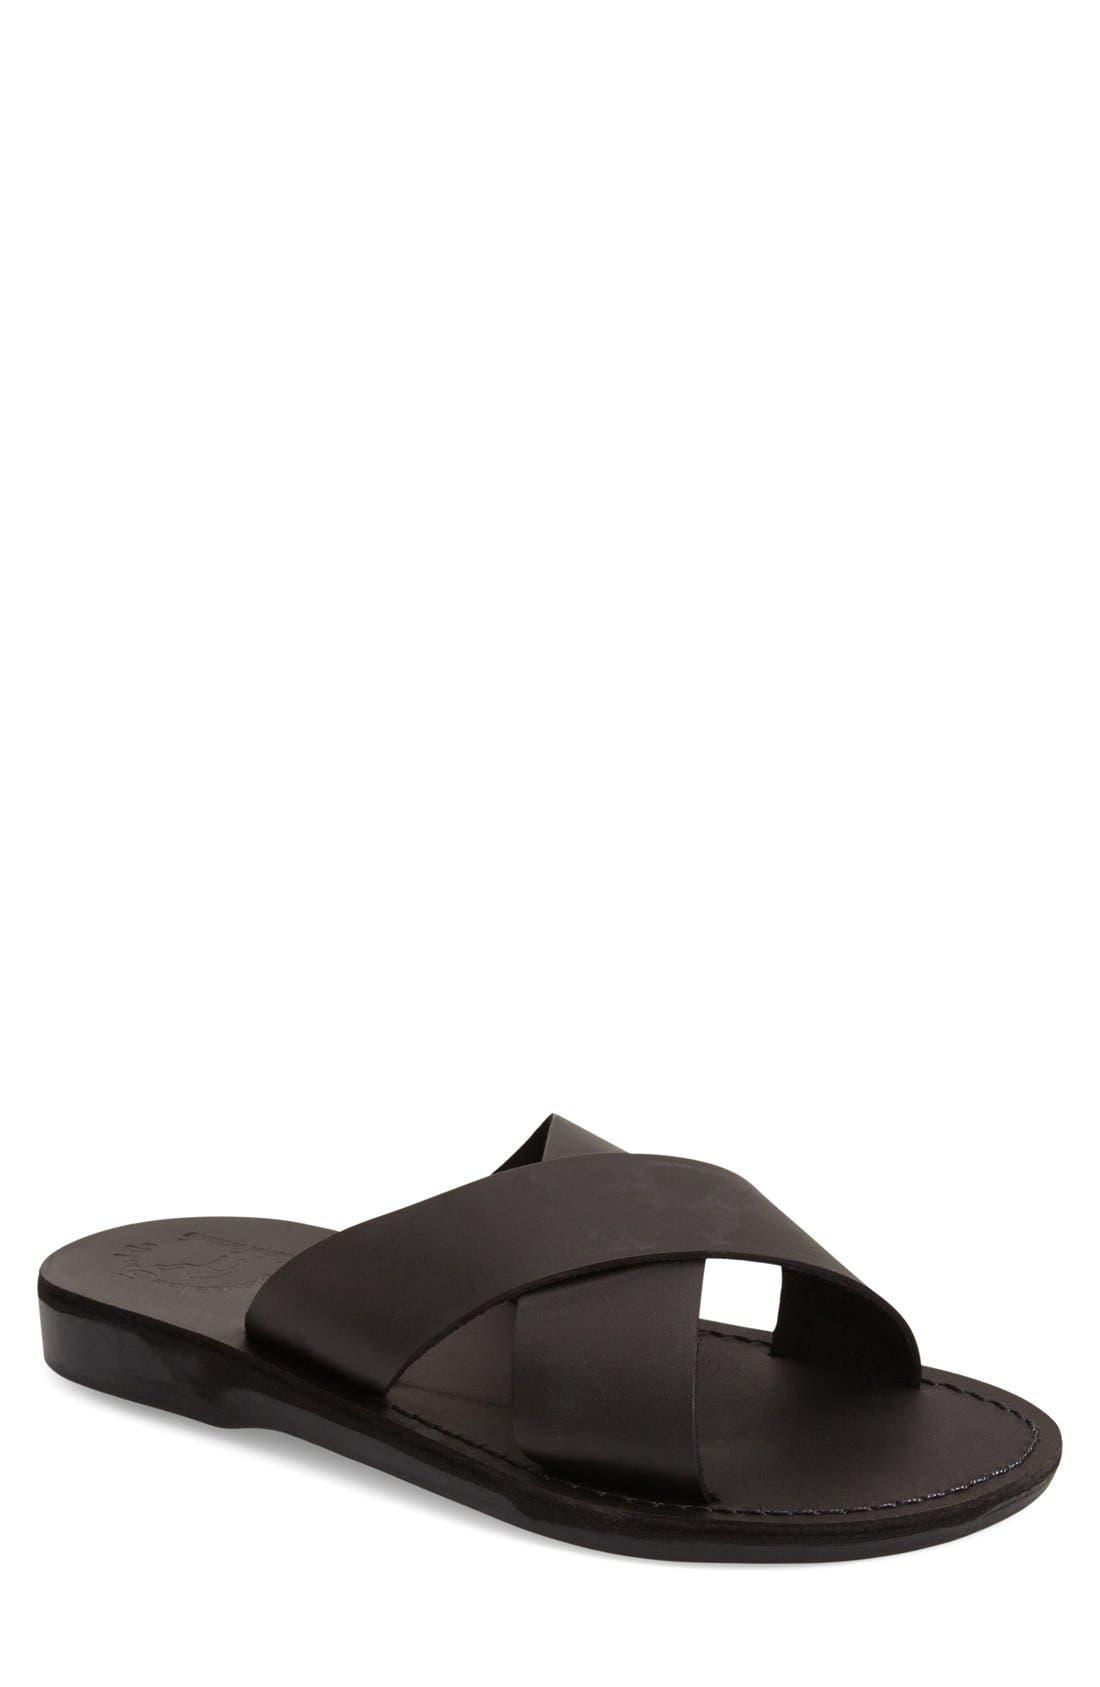 'Elan' Slide Sandal,                             Main thumbnail 1, color,                             BLACK LEATHER